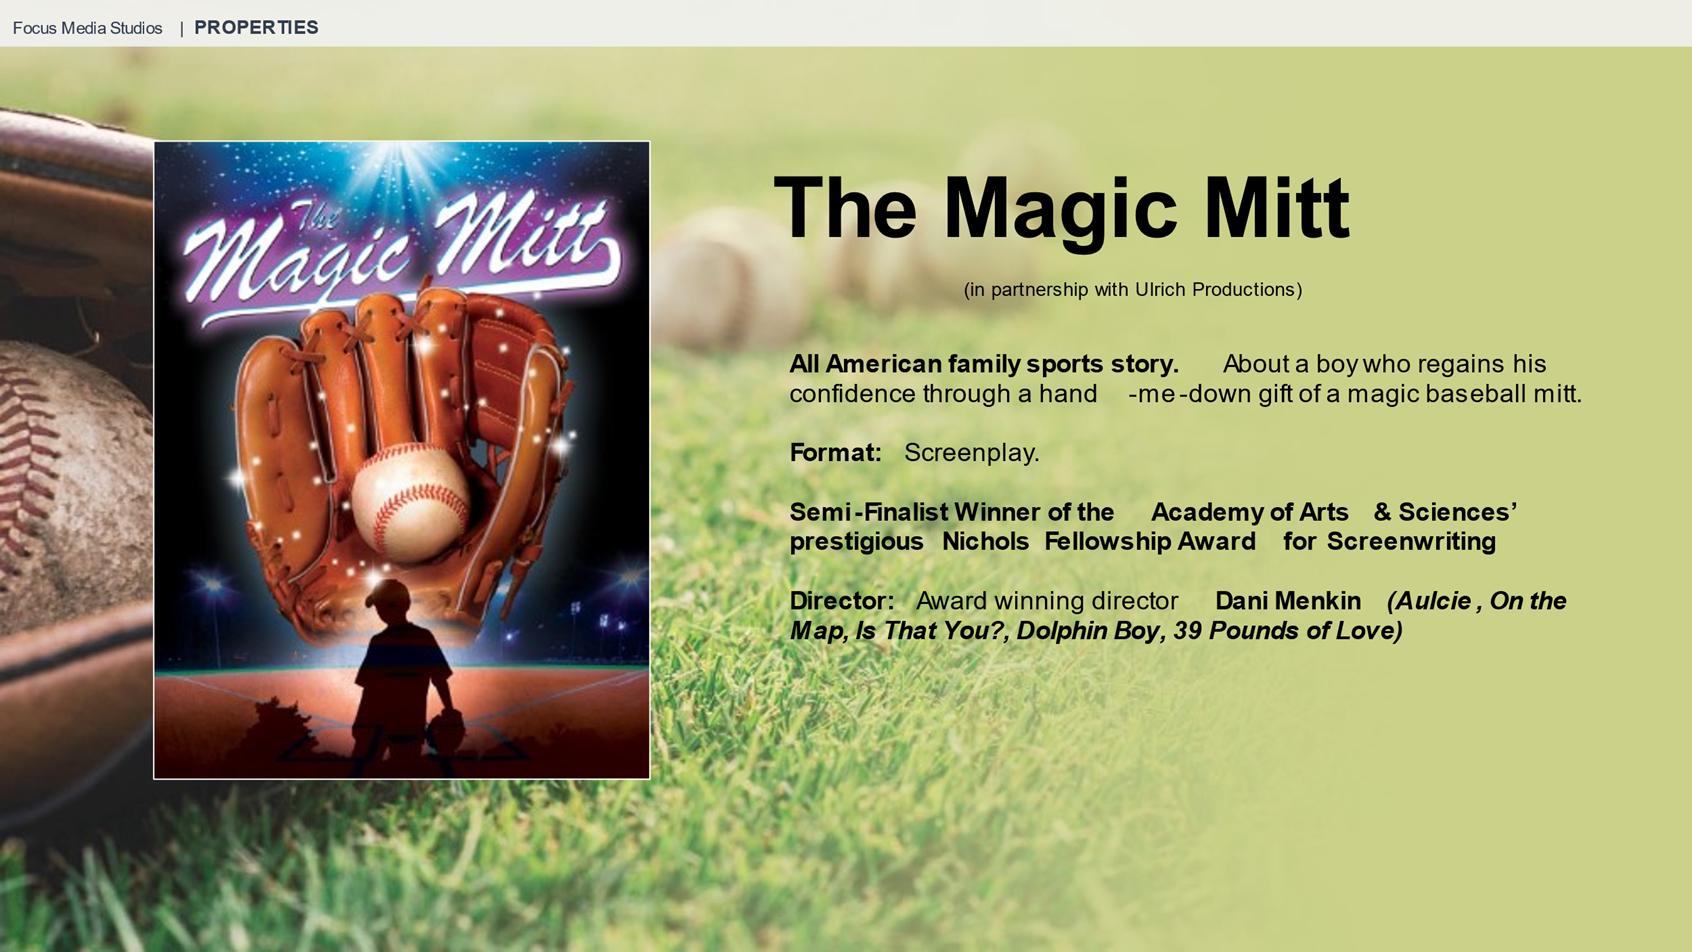 The Magic Mitt Project